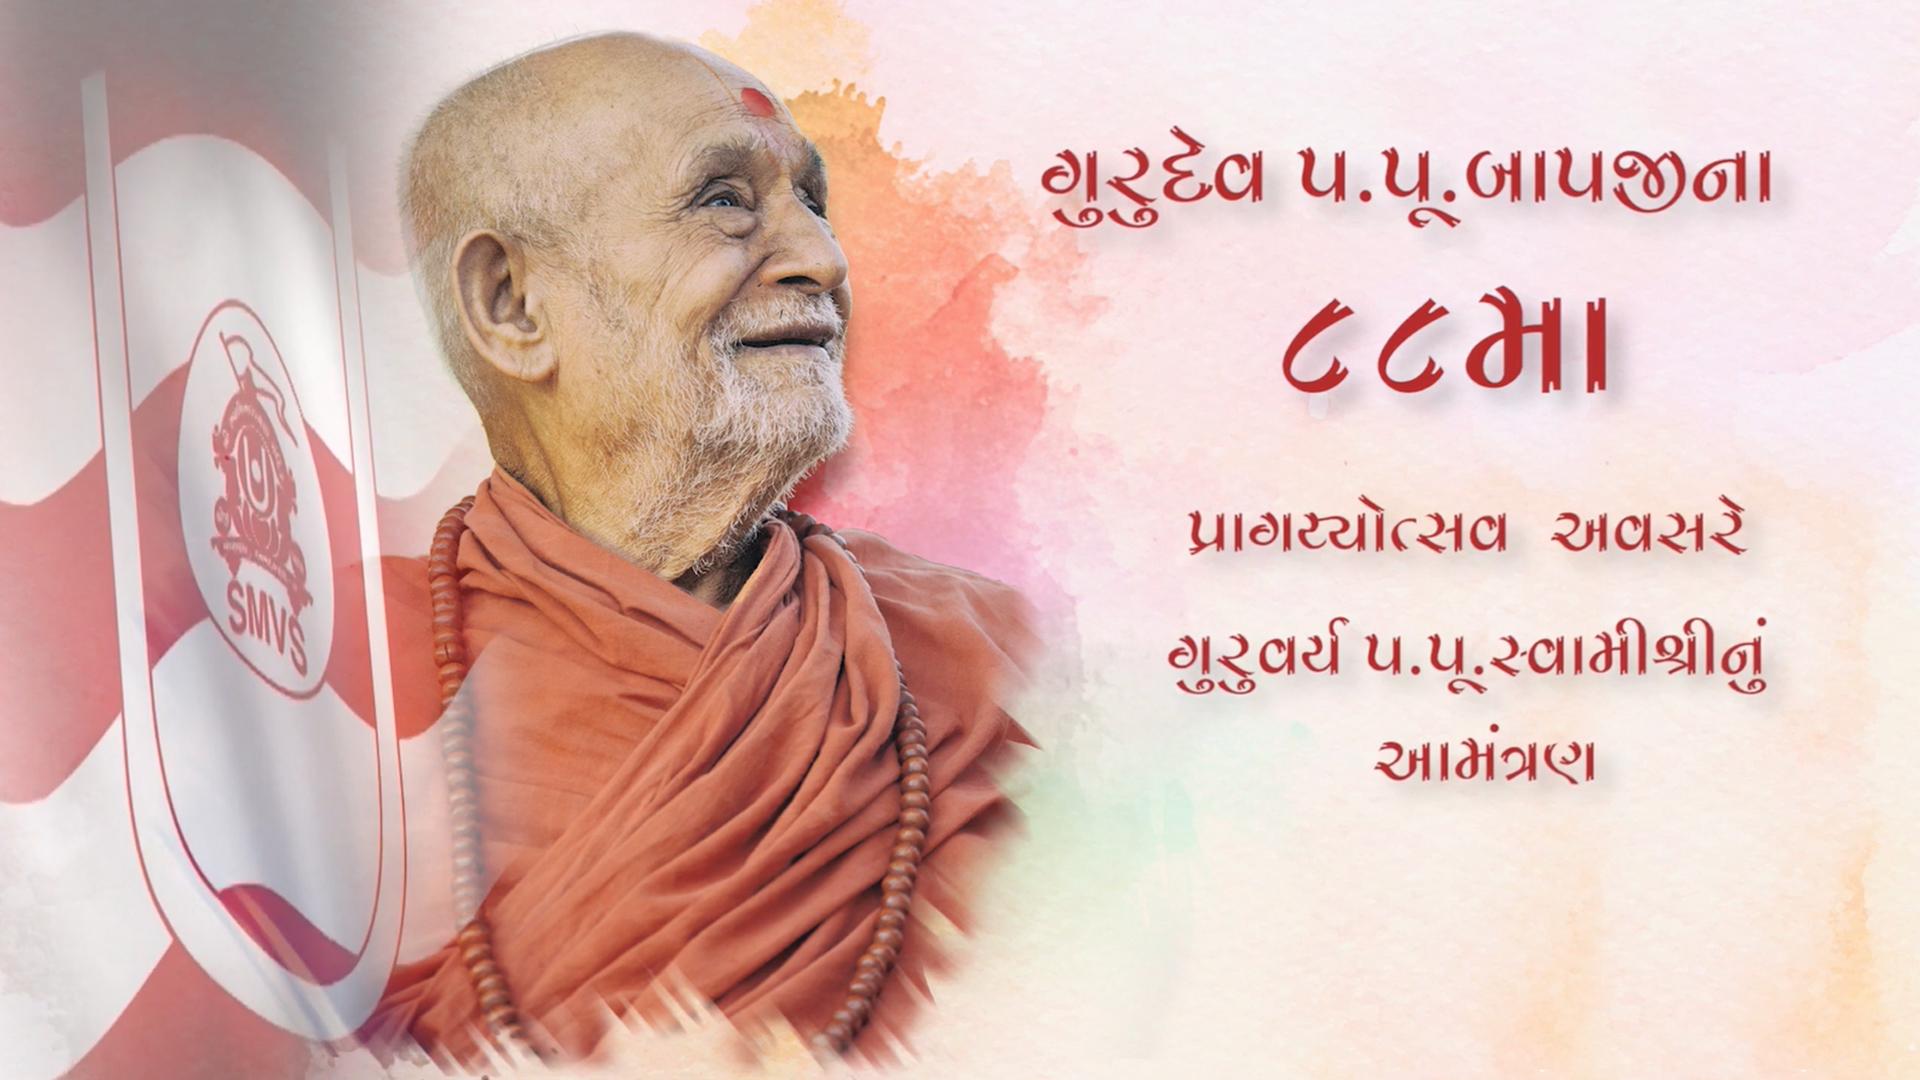 Gurudev HDH Bapji 88th Pragatyotsav Invitation | HDH Swamishri